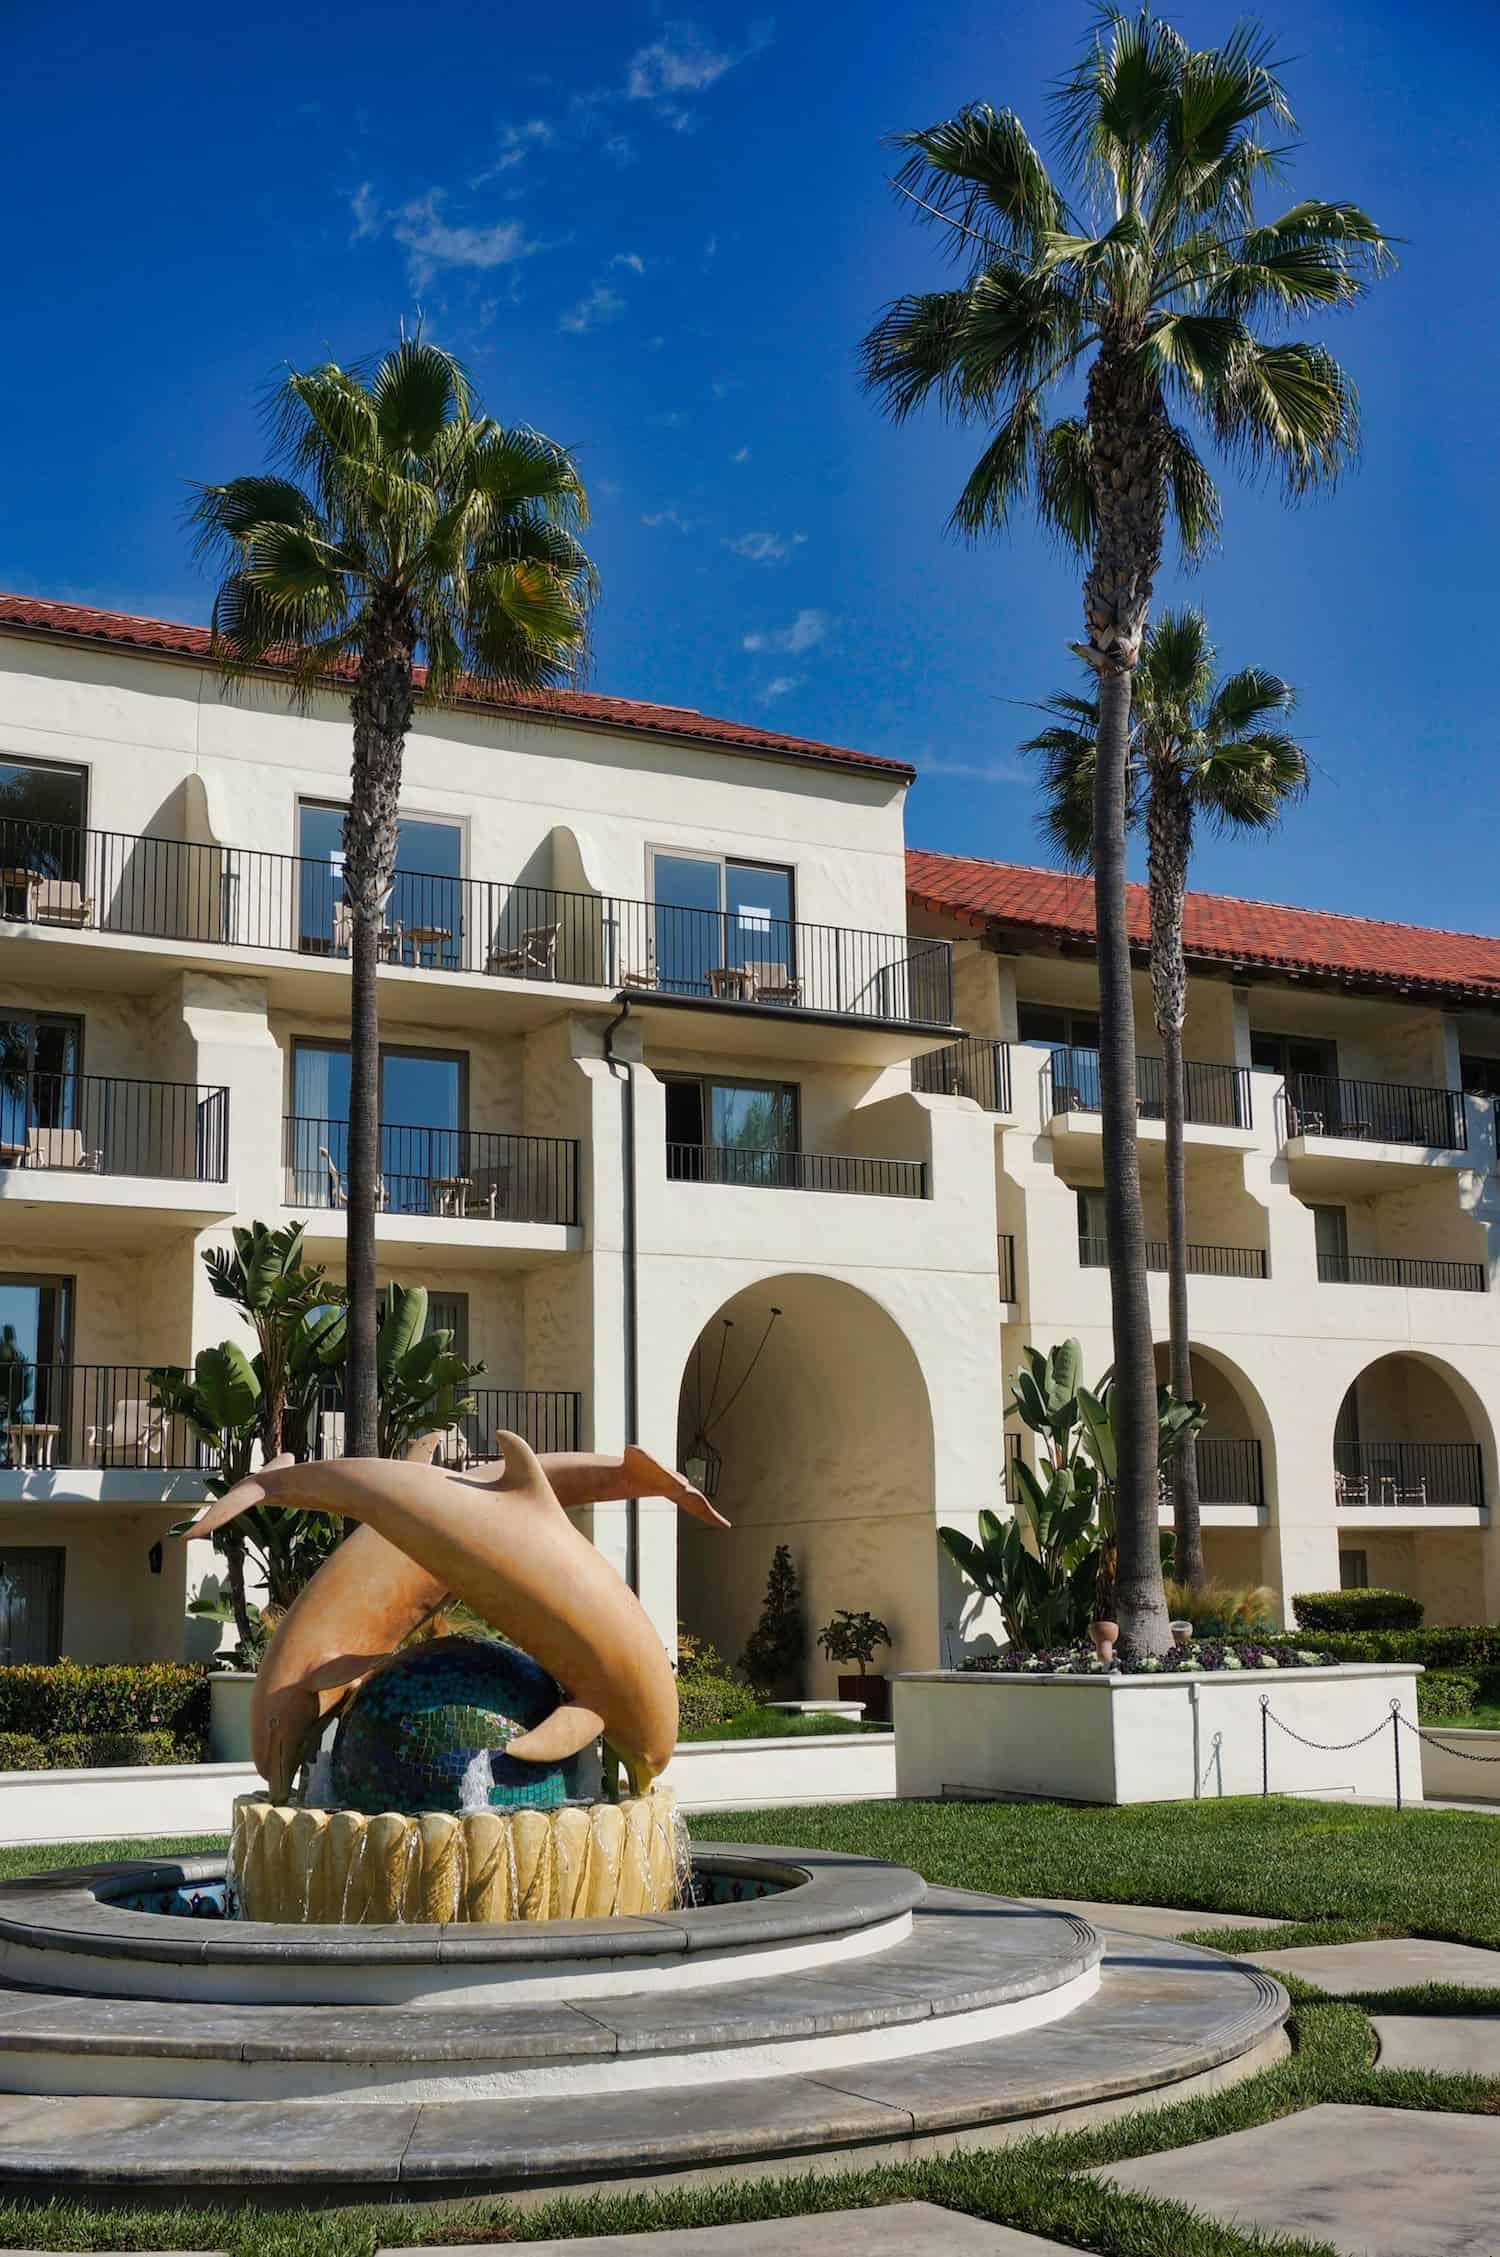 3 Days in Huntington Beach - Hyatt Regency